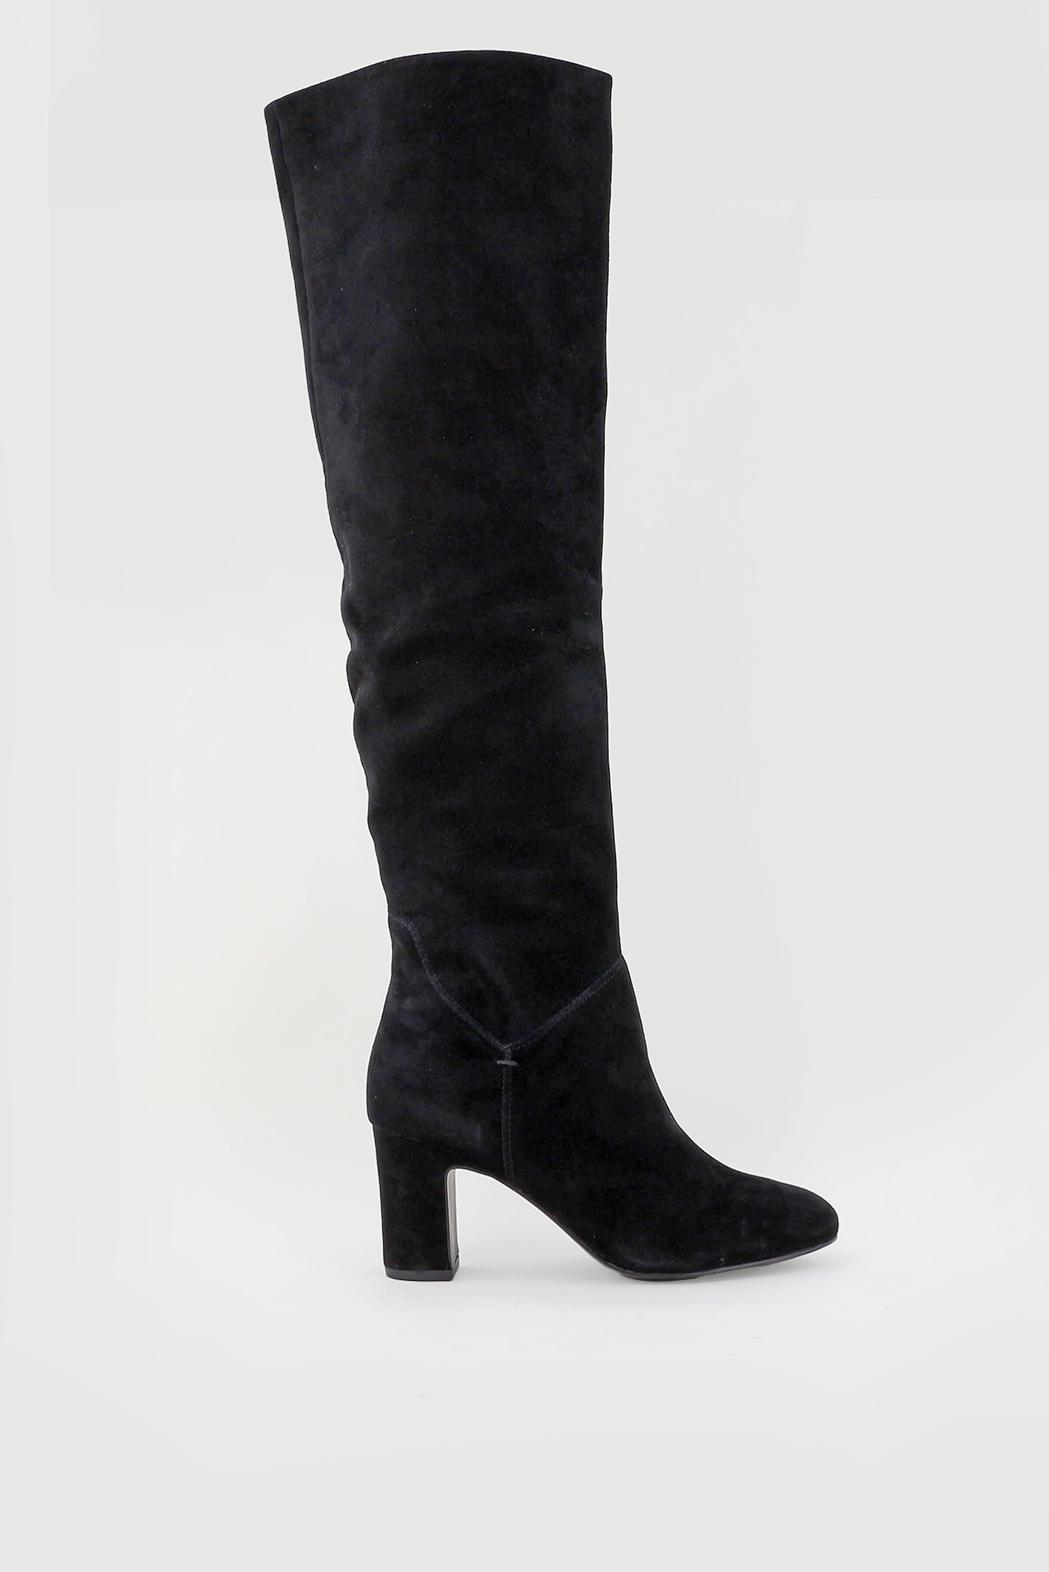 Bibi Lou hoge laarzen 527B30VK zwart